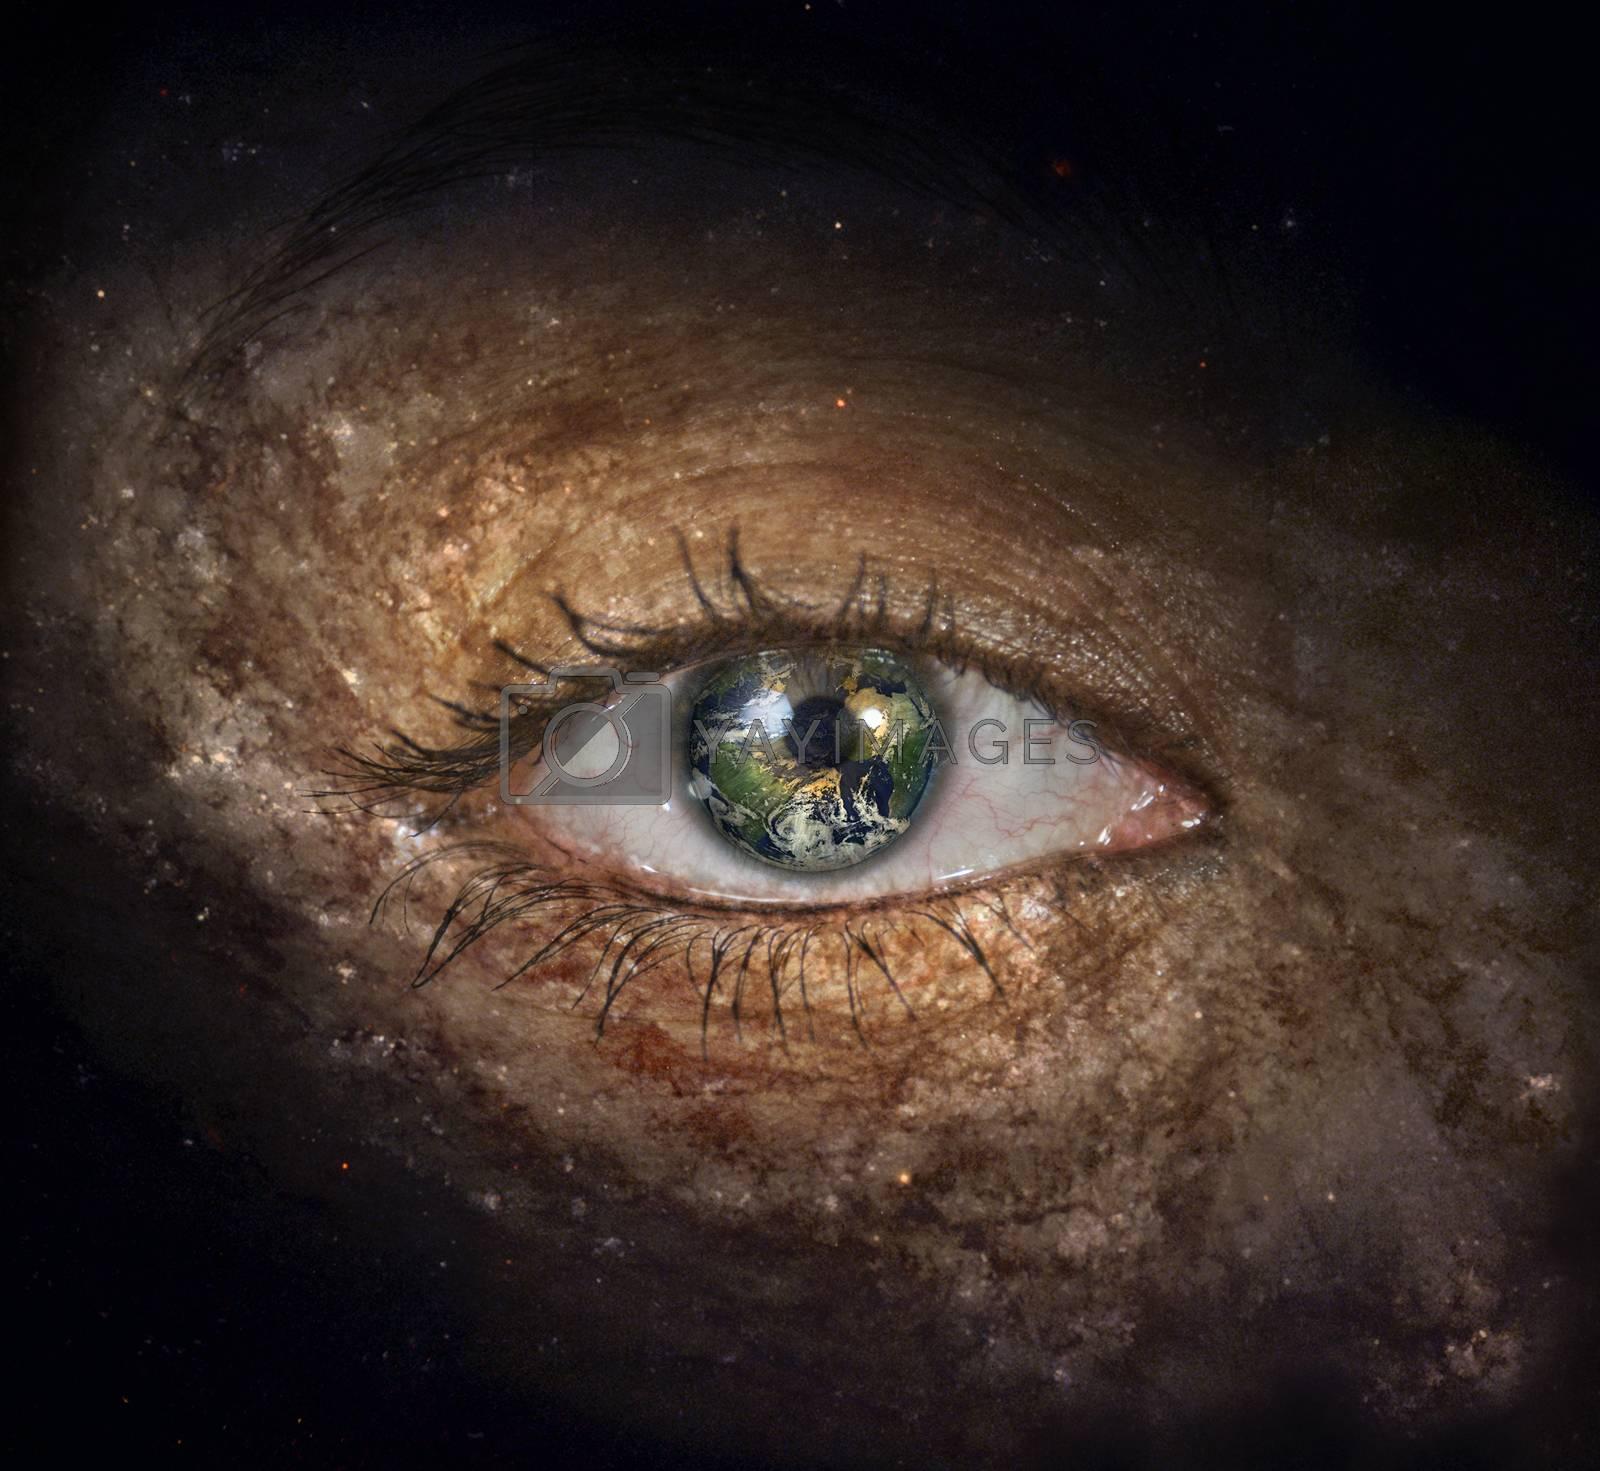 Surrealism. Woman's eye with galaxies. Planet Earth Iris.